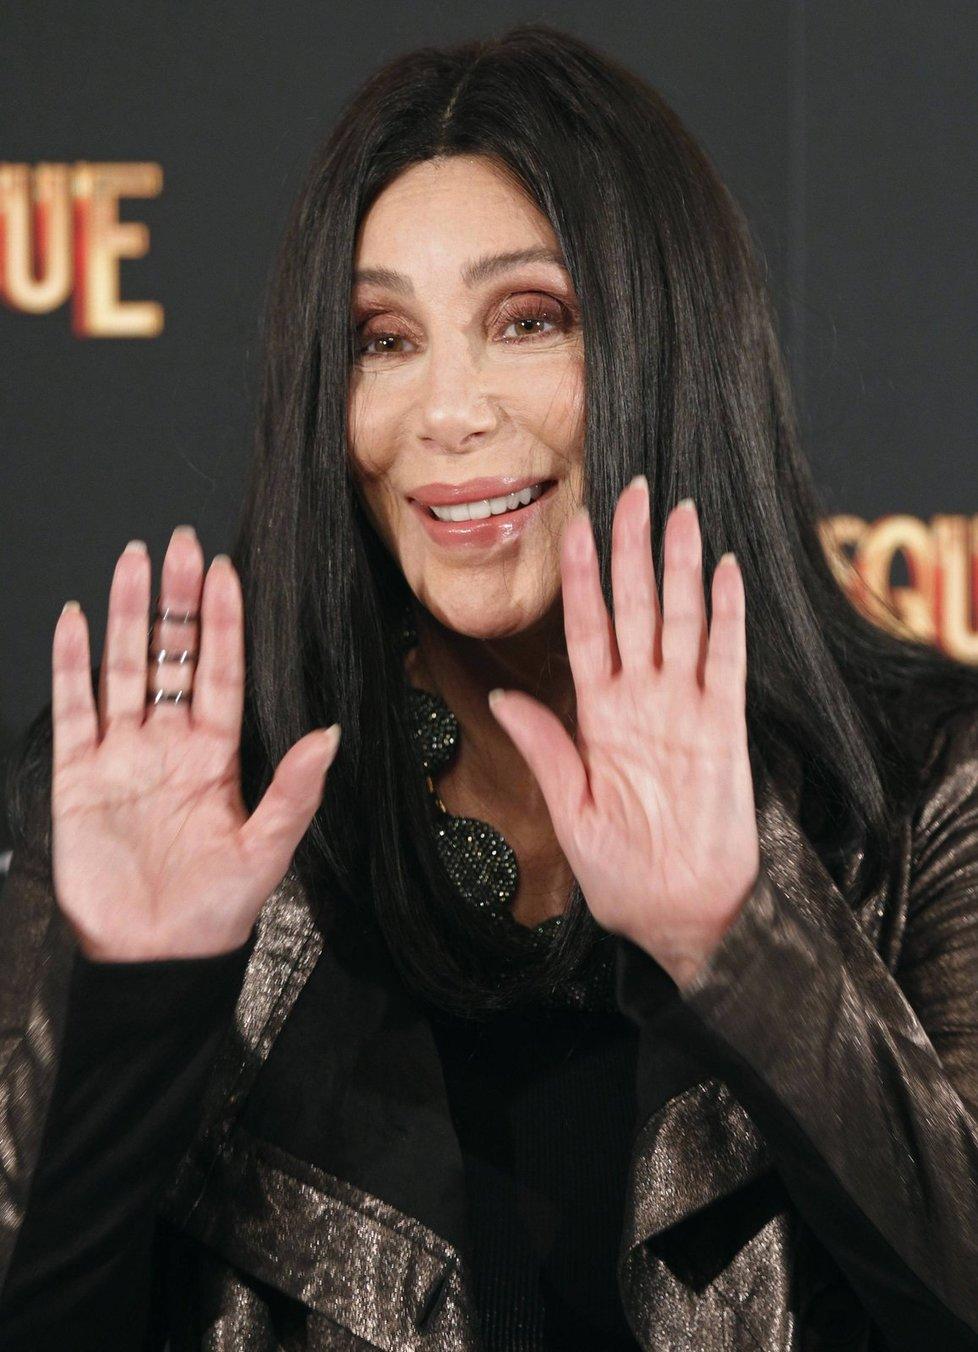 Zpěvačka Cher v roce 2010